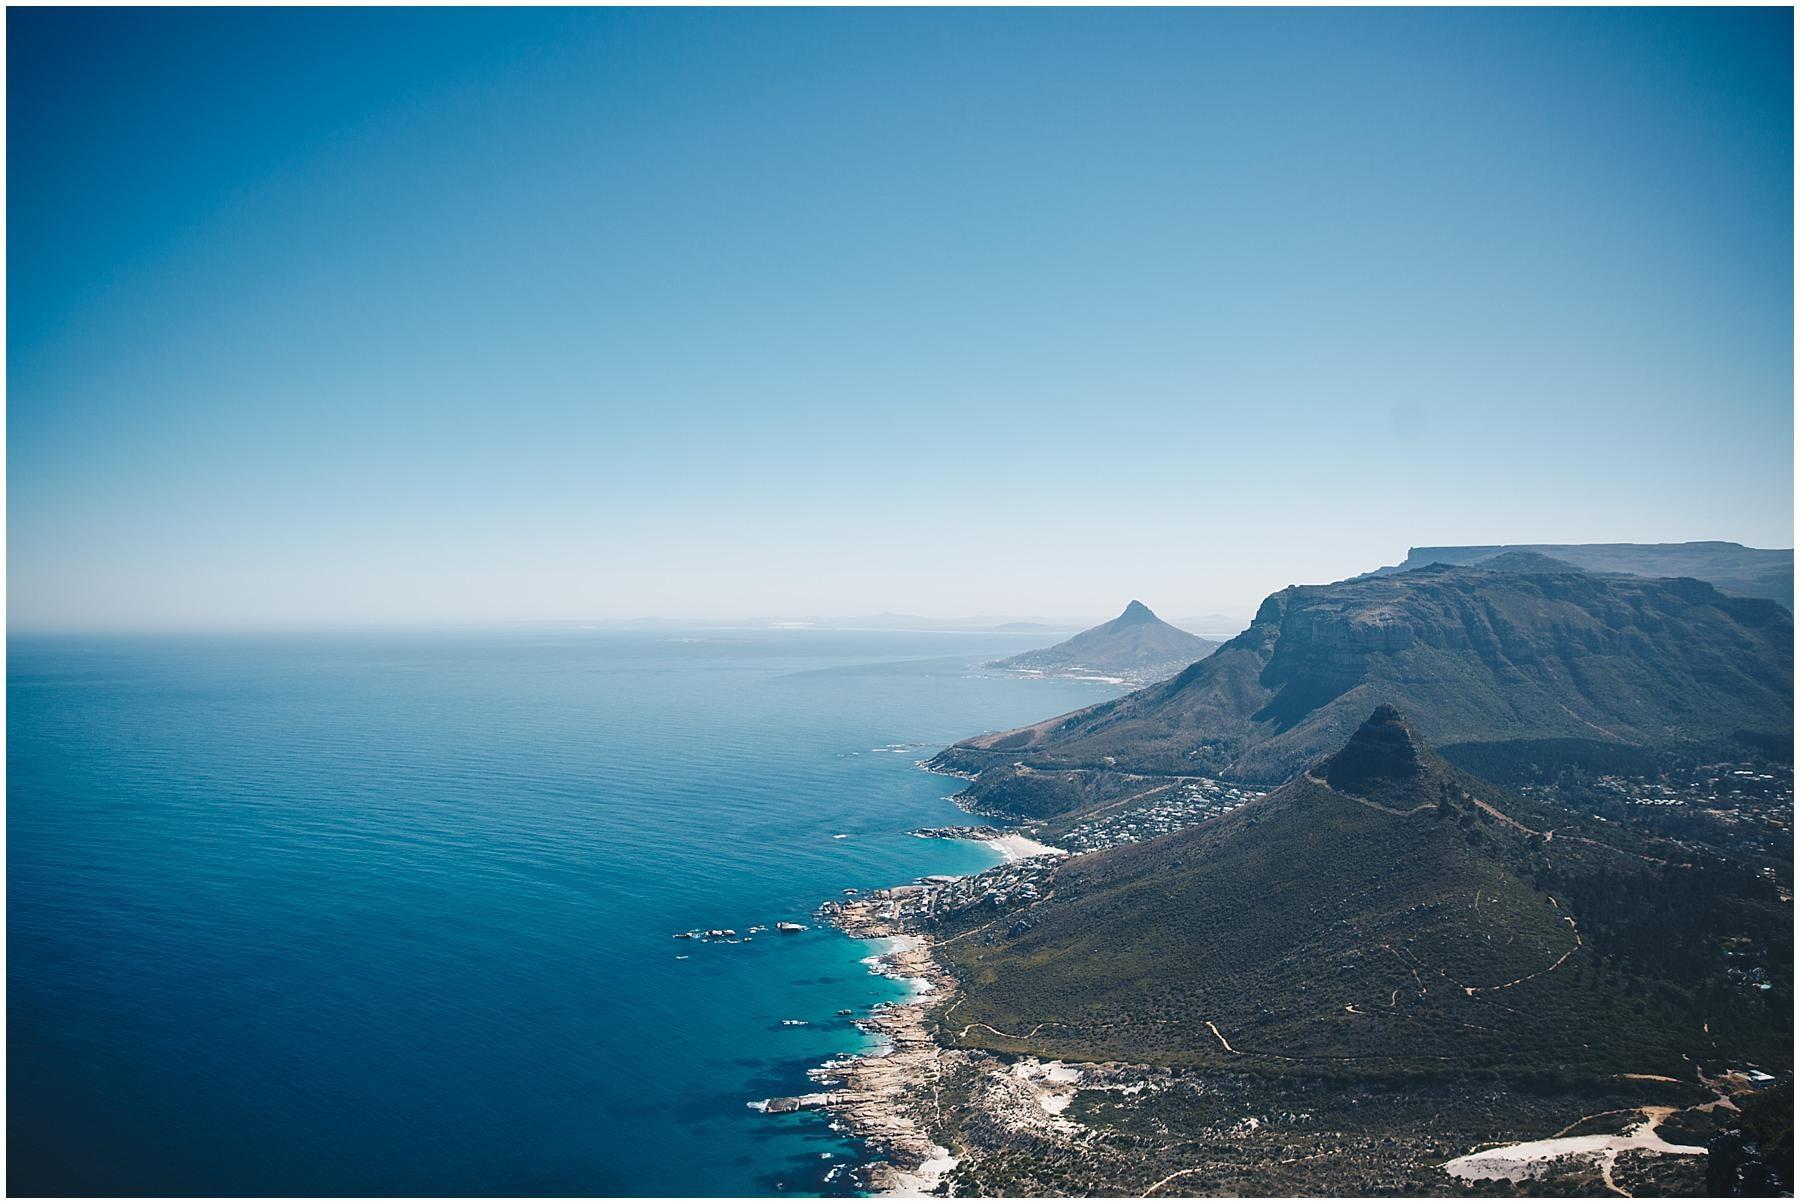 Cape Town_Suther Peak_0007.jpg